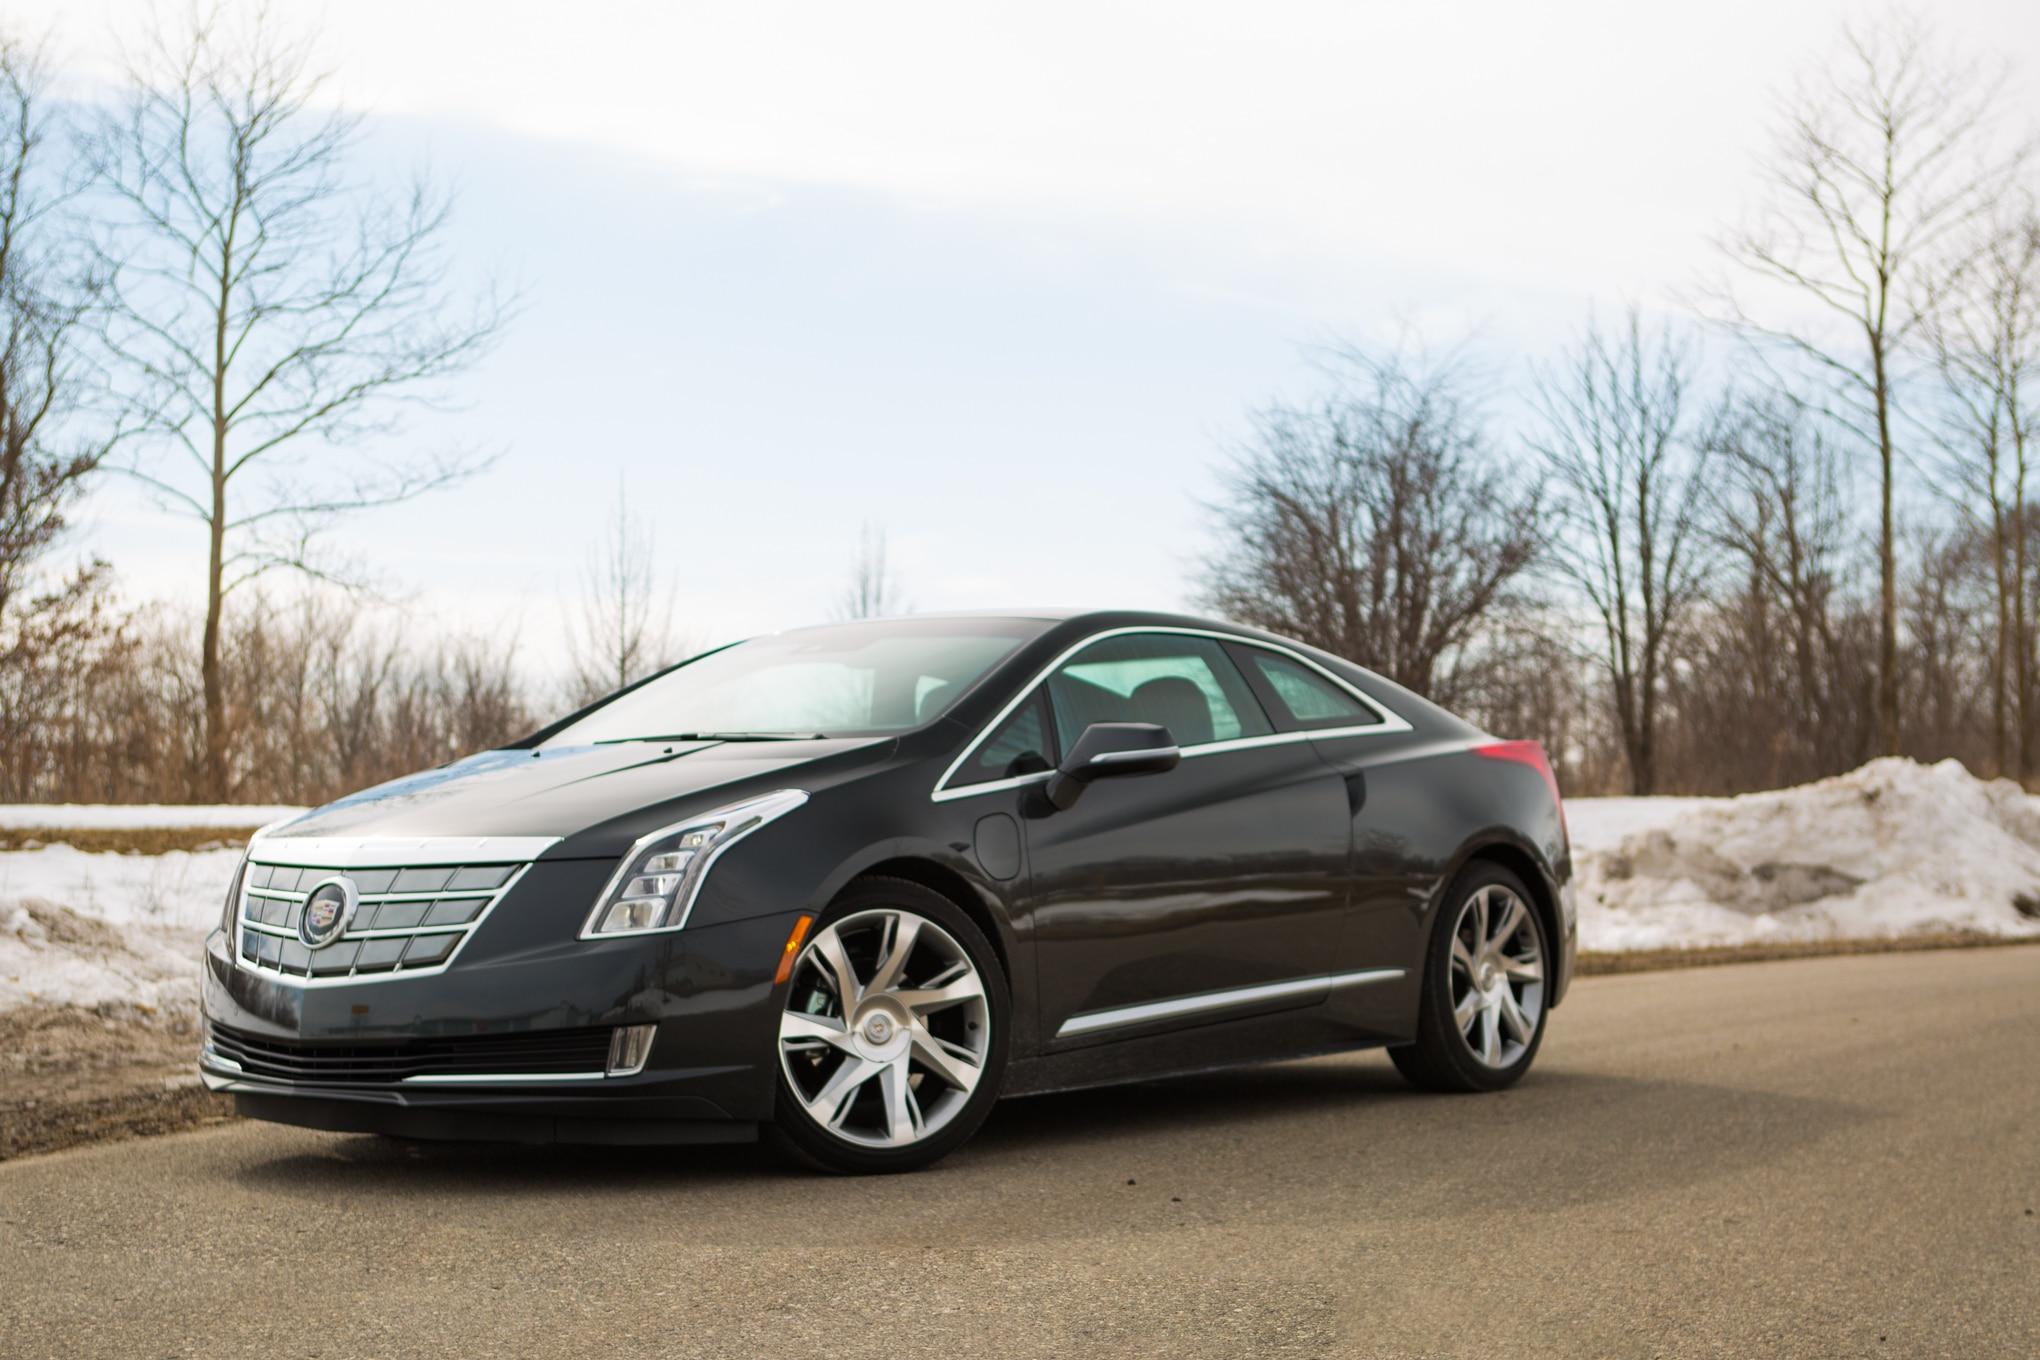 2014 Cadillac ELR Front Three Quarters